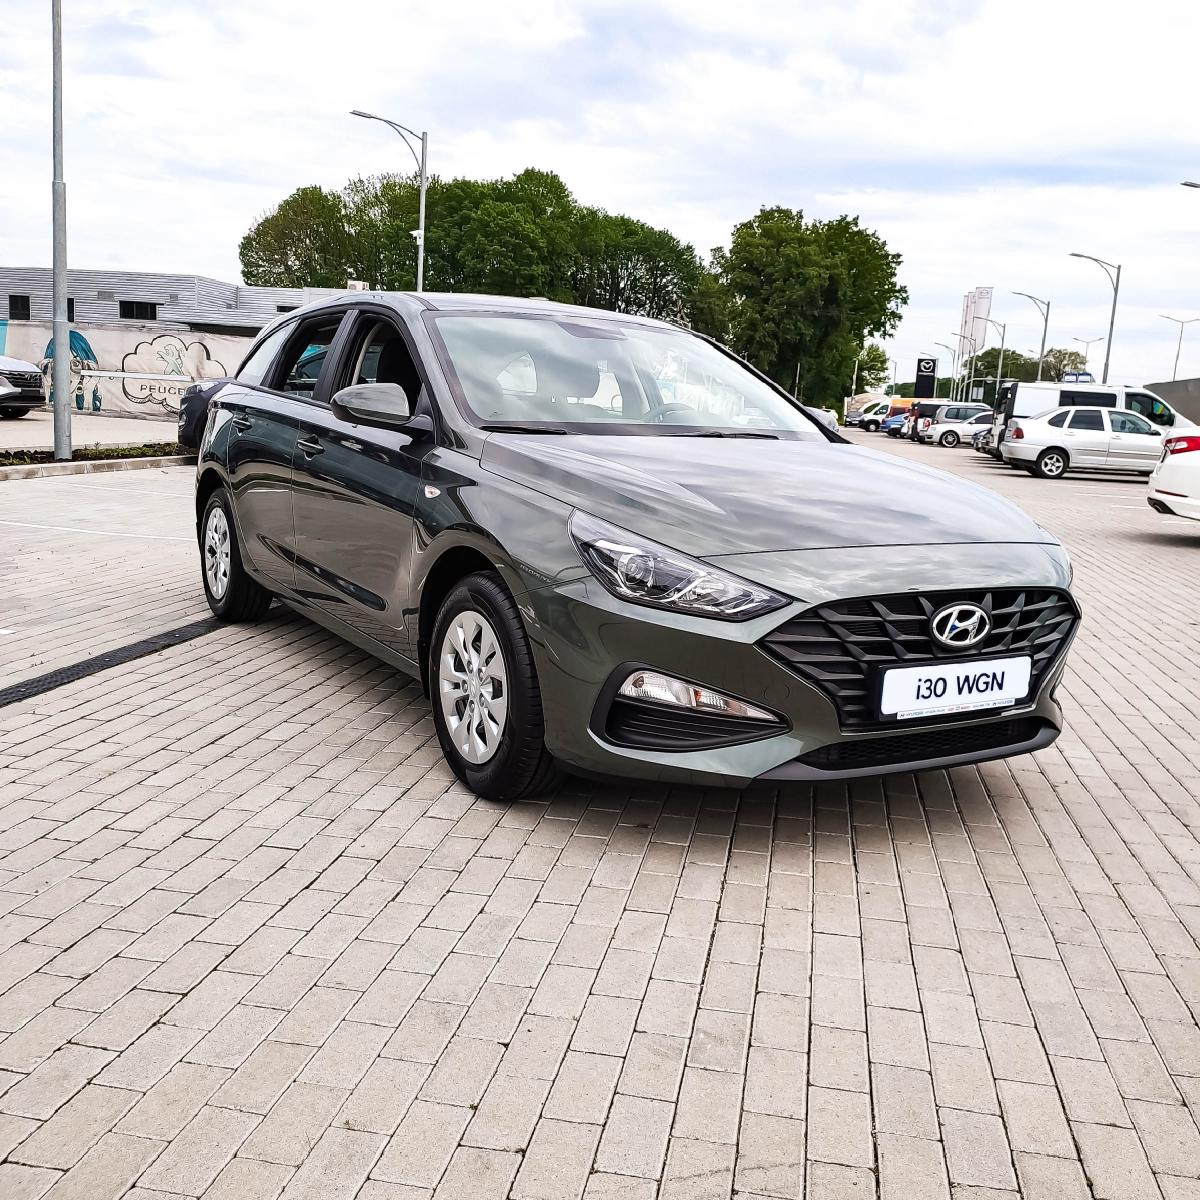 Спеціальна вигода на придбання Hyundai i30 WGN!   Хюндай Мотор Україна - фото 13